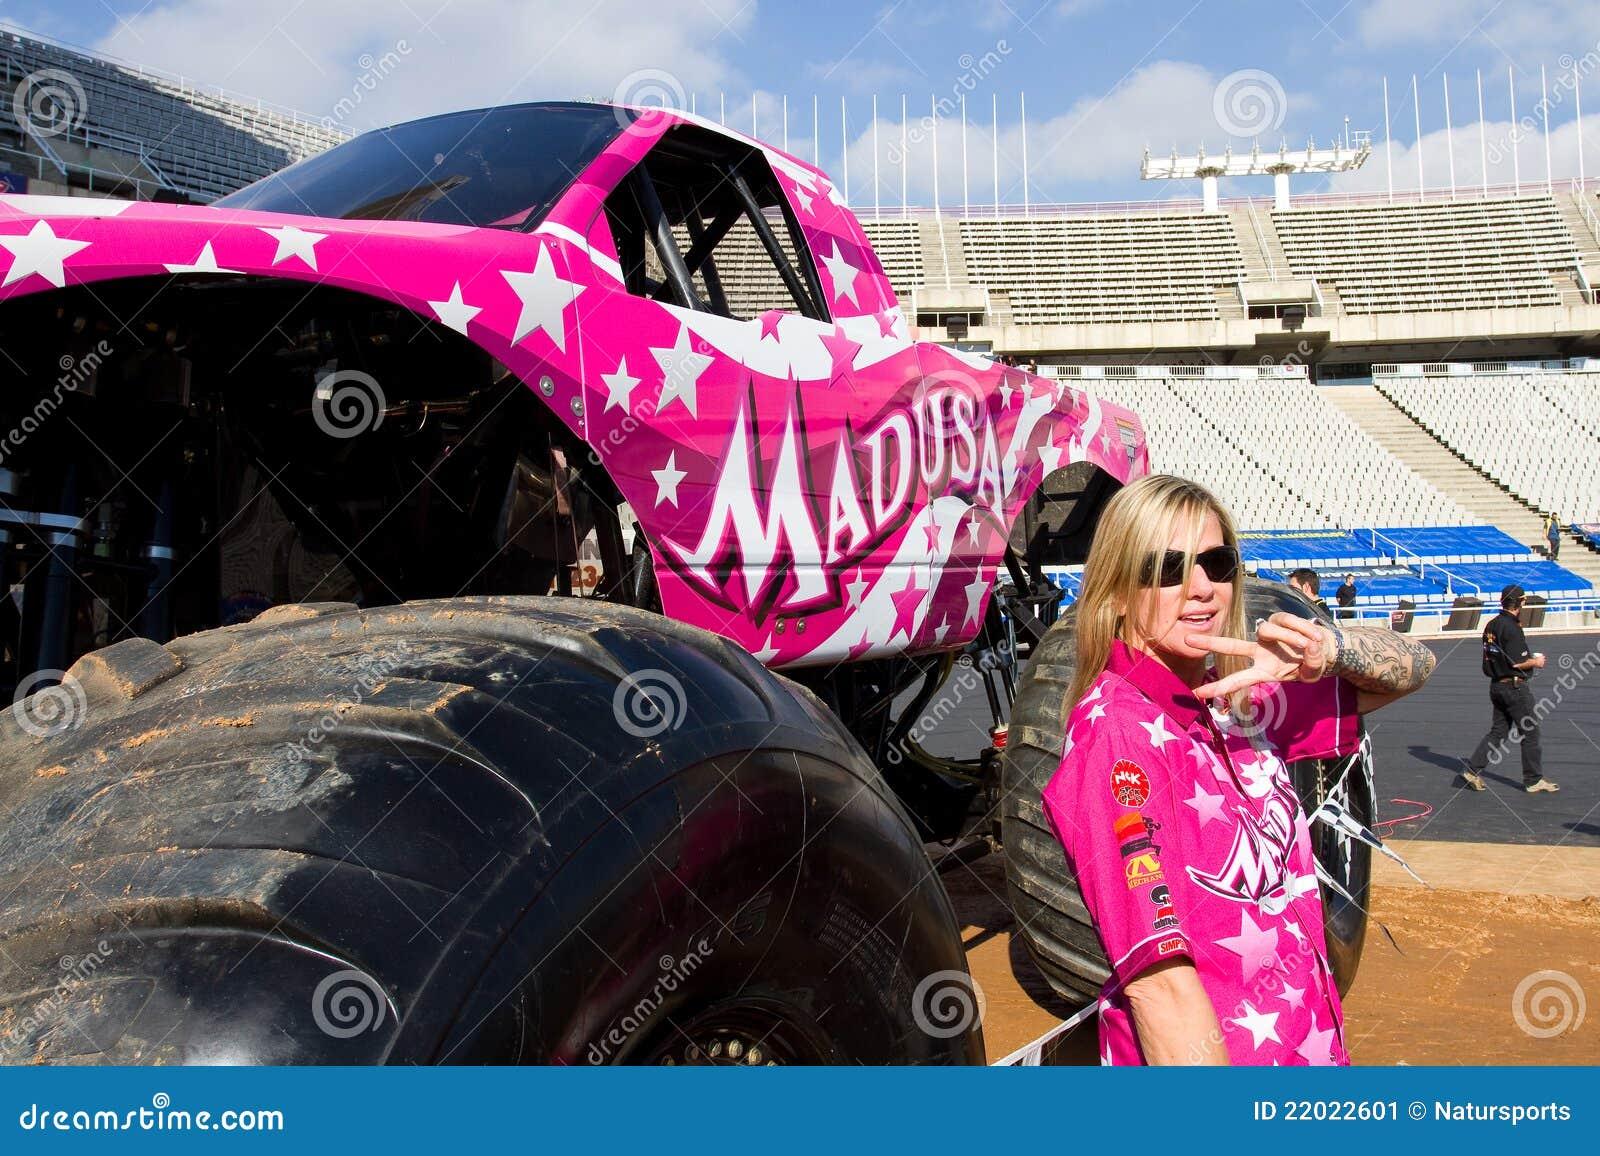 Ausmalbild Madusa Monster Truck: Debra Miceli Driver Editorial Photo. Image Of Blond, Pink